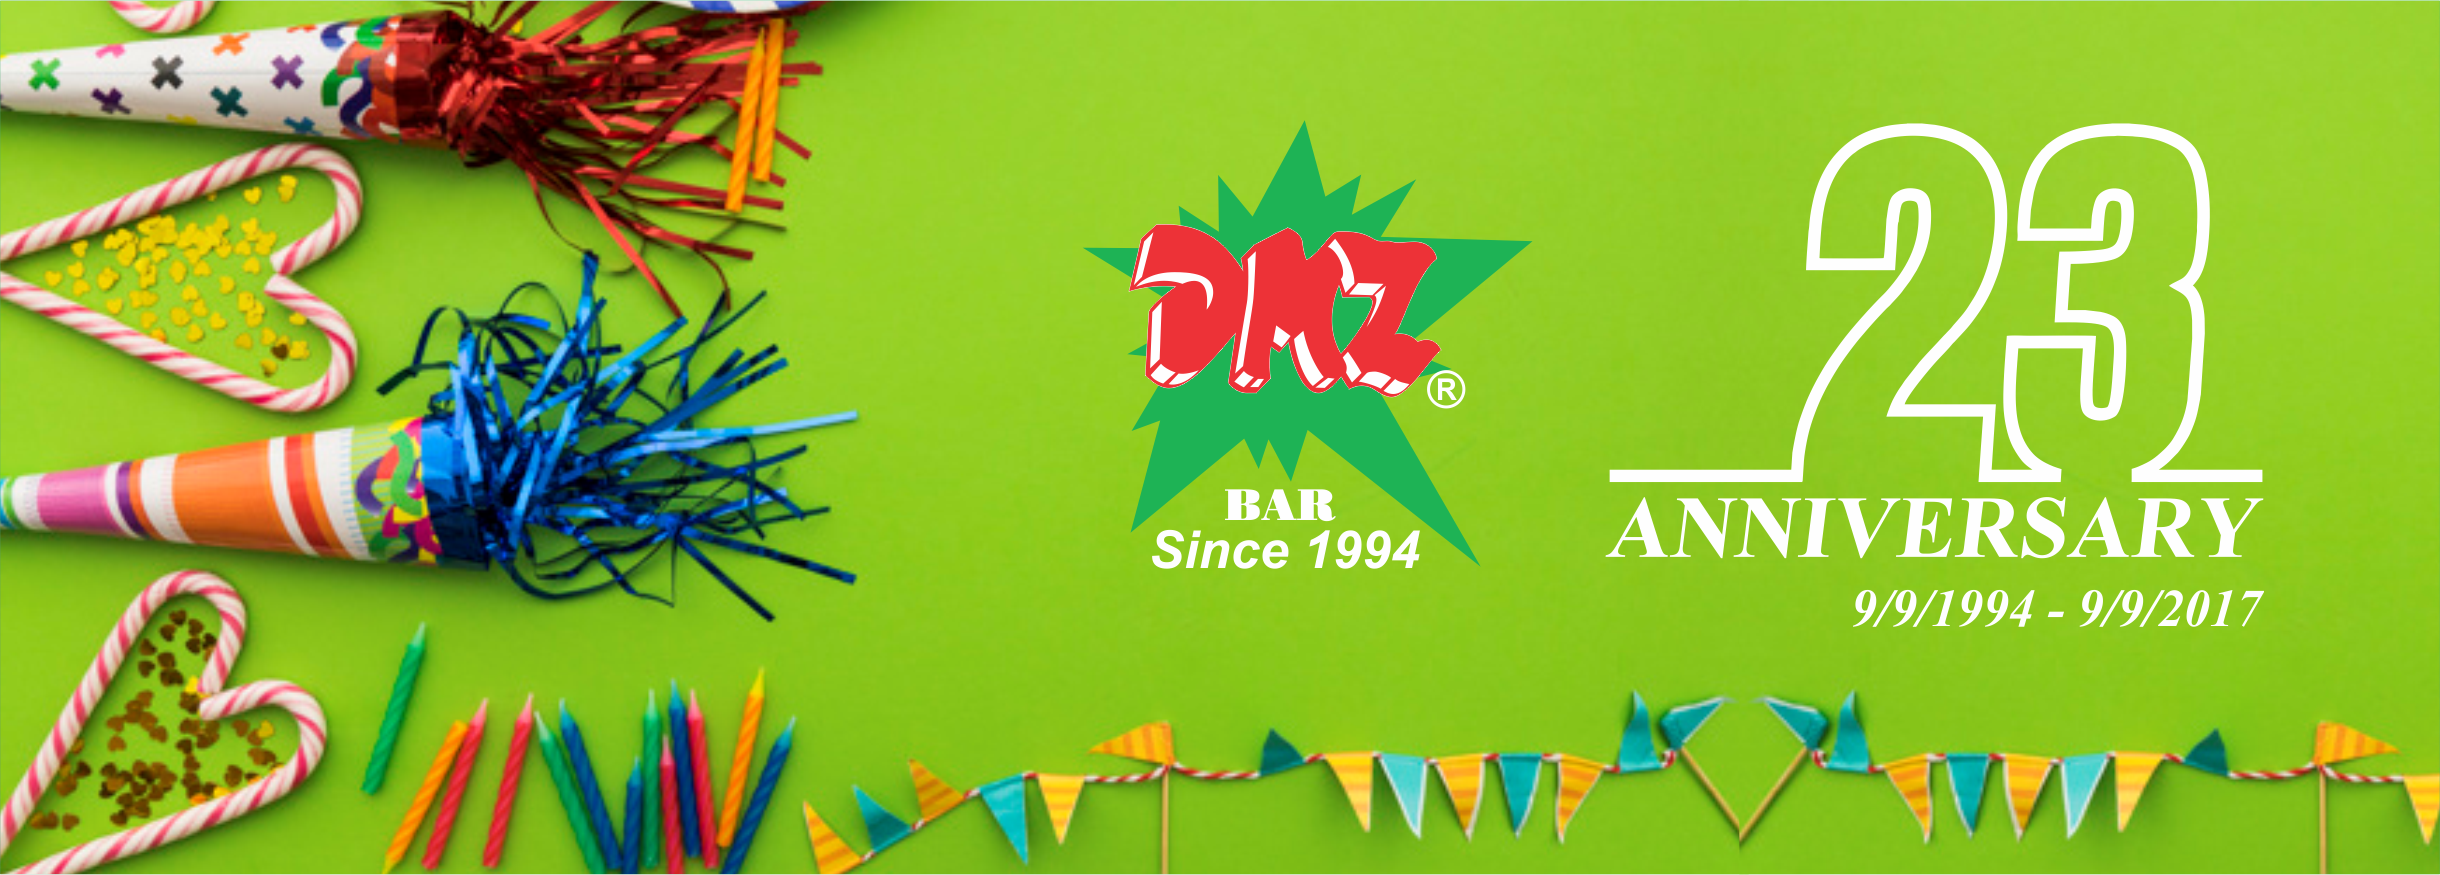 23 YEARS WEB DMZ